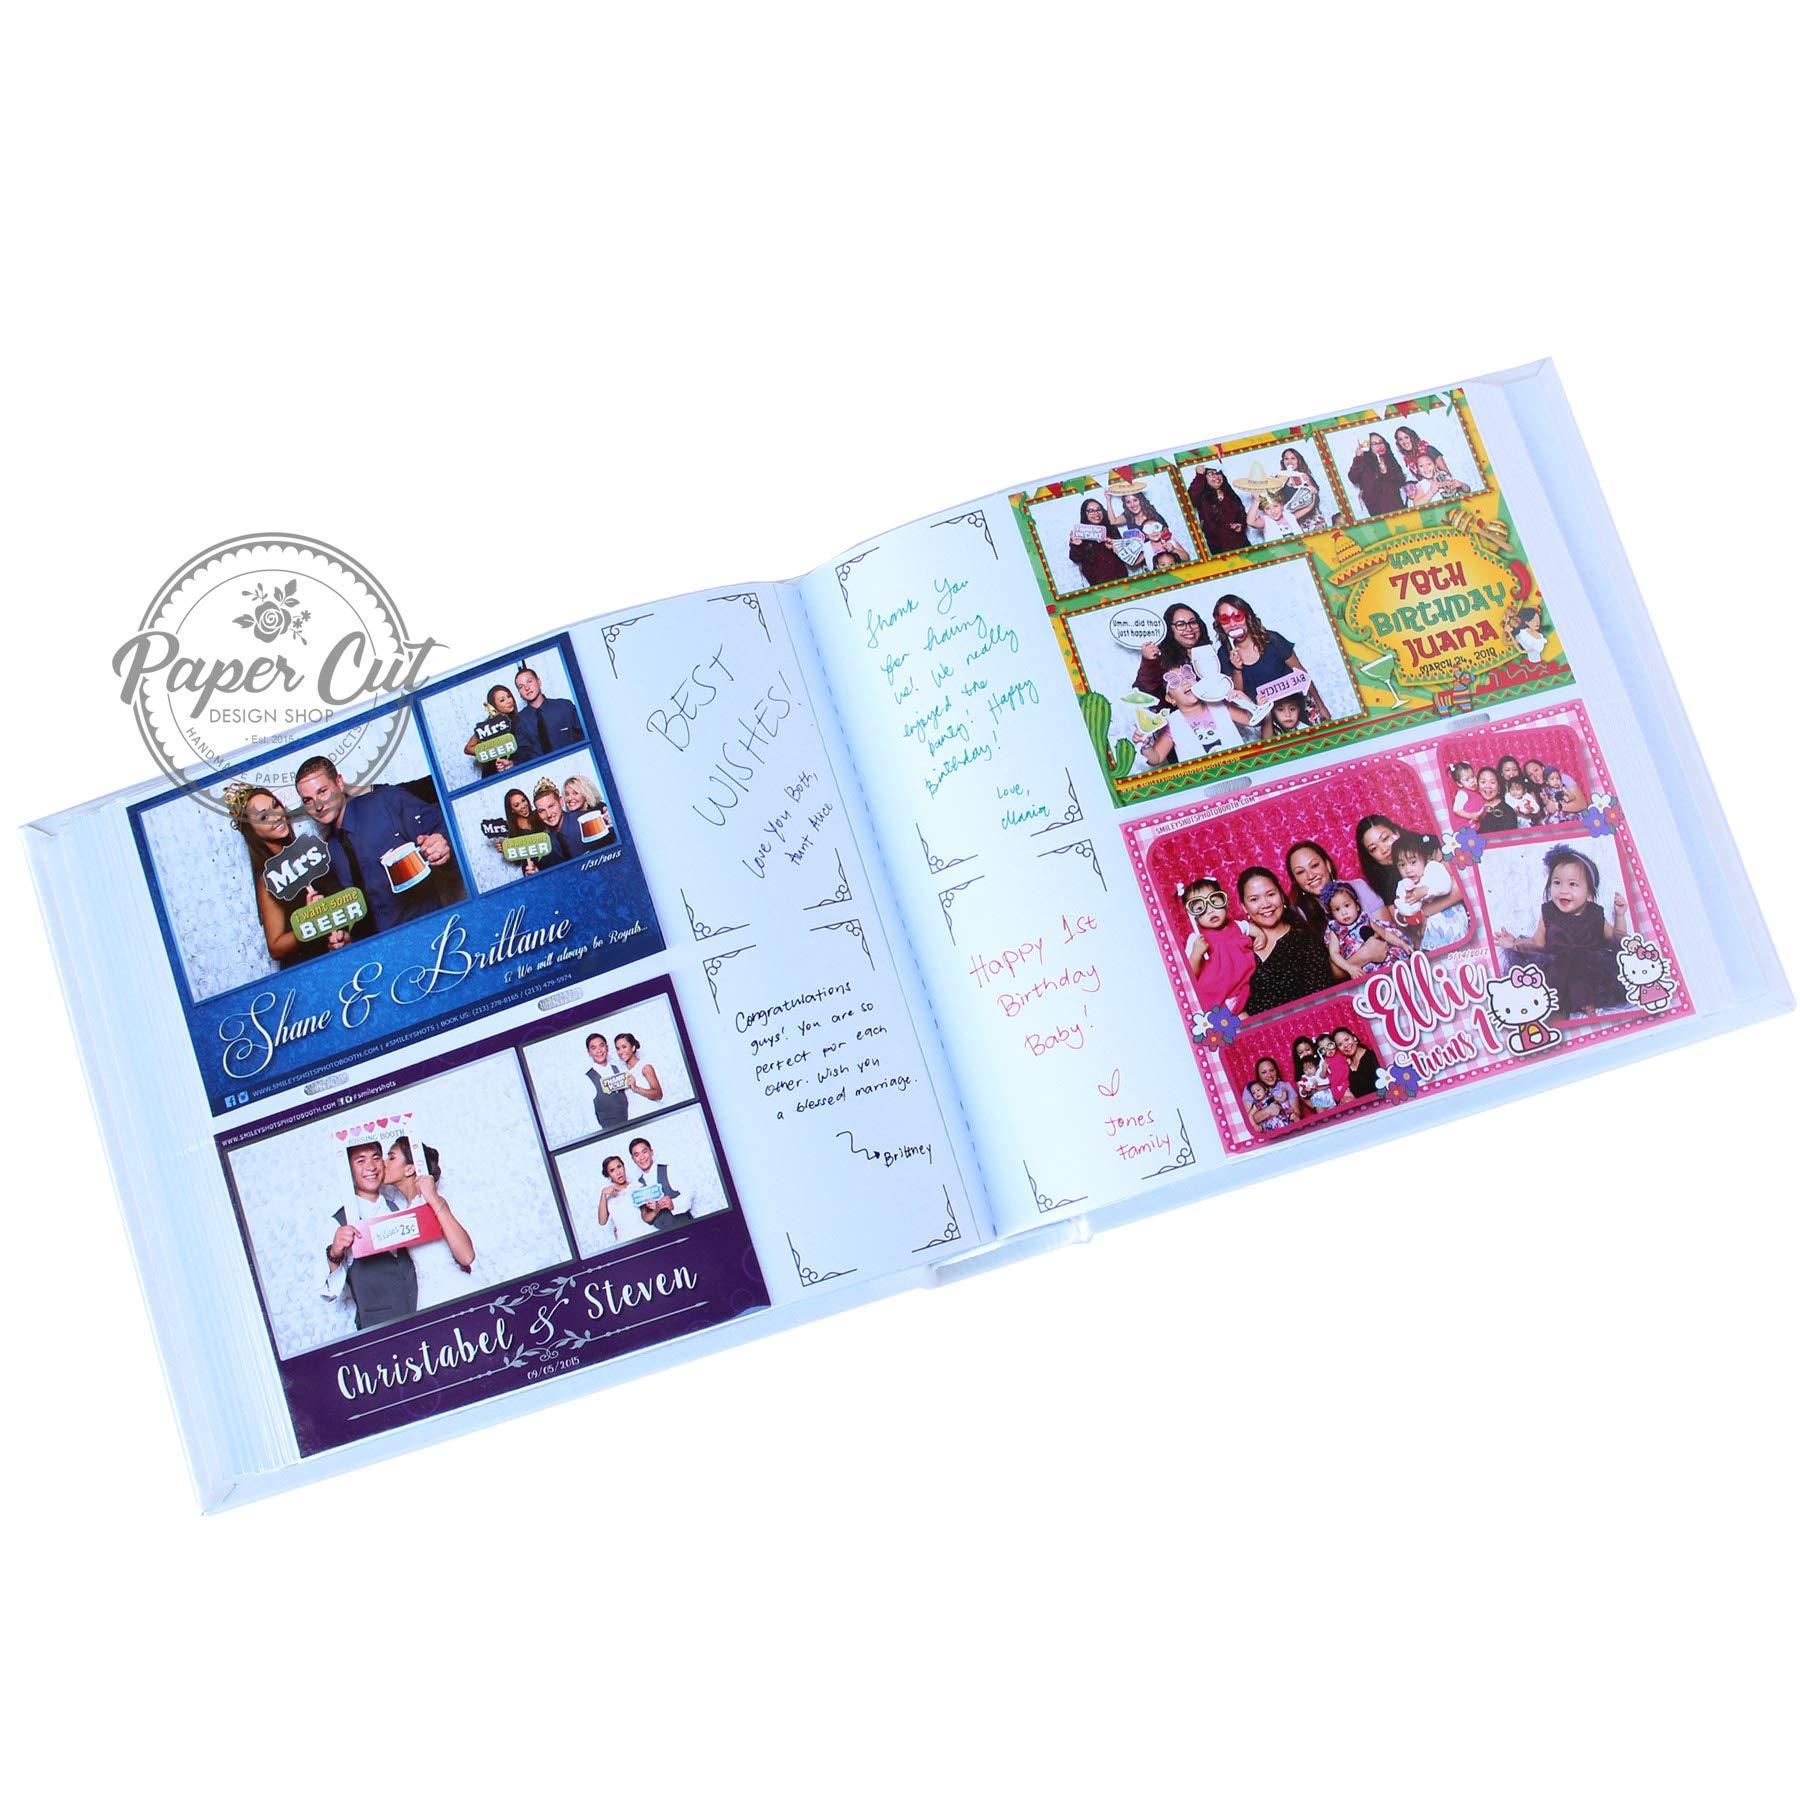 Paper Cut Design Shop Photo Booth Album Slip-in Plastic Slots with Keepsake Box Elegant Leatherette Album 4x6 Photos - White by Paper Cut Design Shop